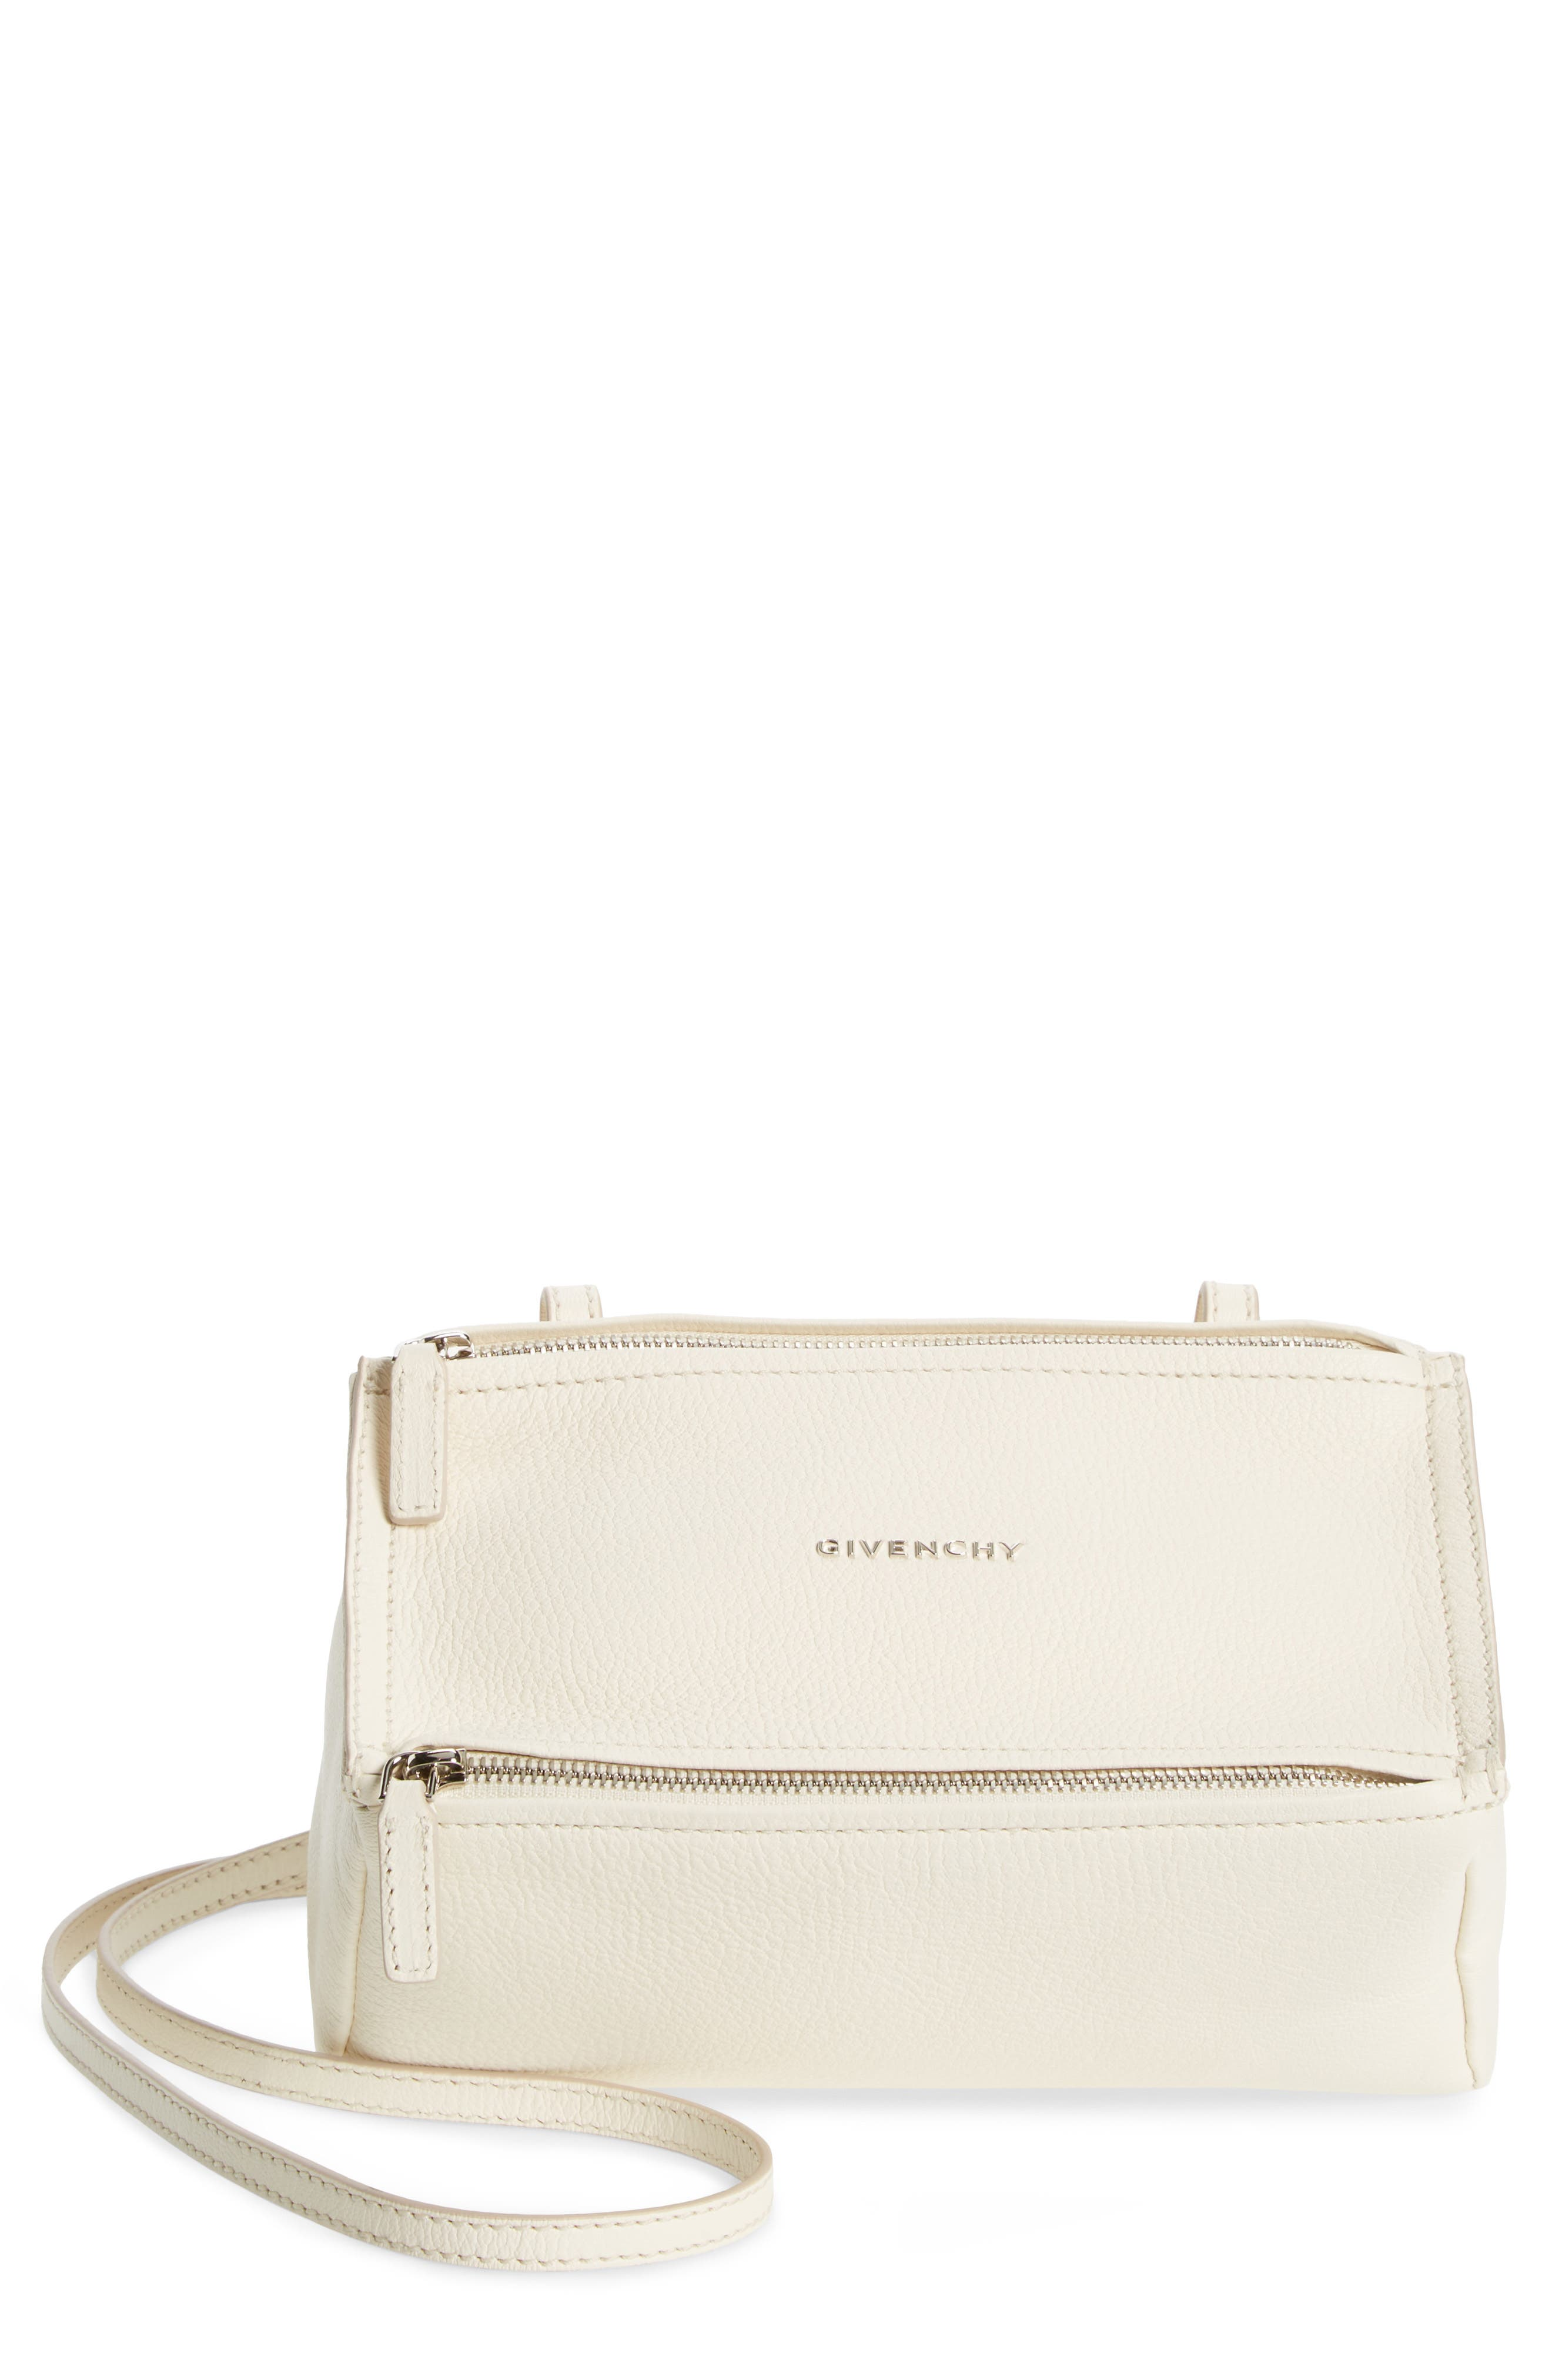 Alternate Image 1 Selected - Givenchy 'Mini Pandora' Sugar Leather Shoulder Bag